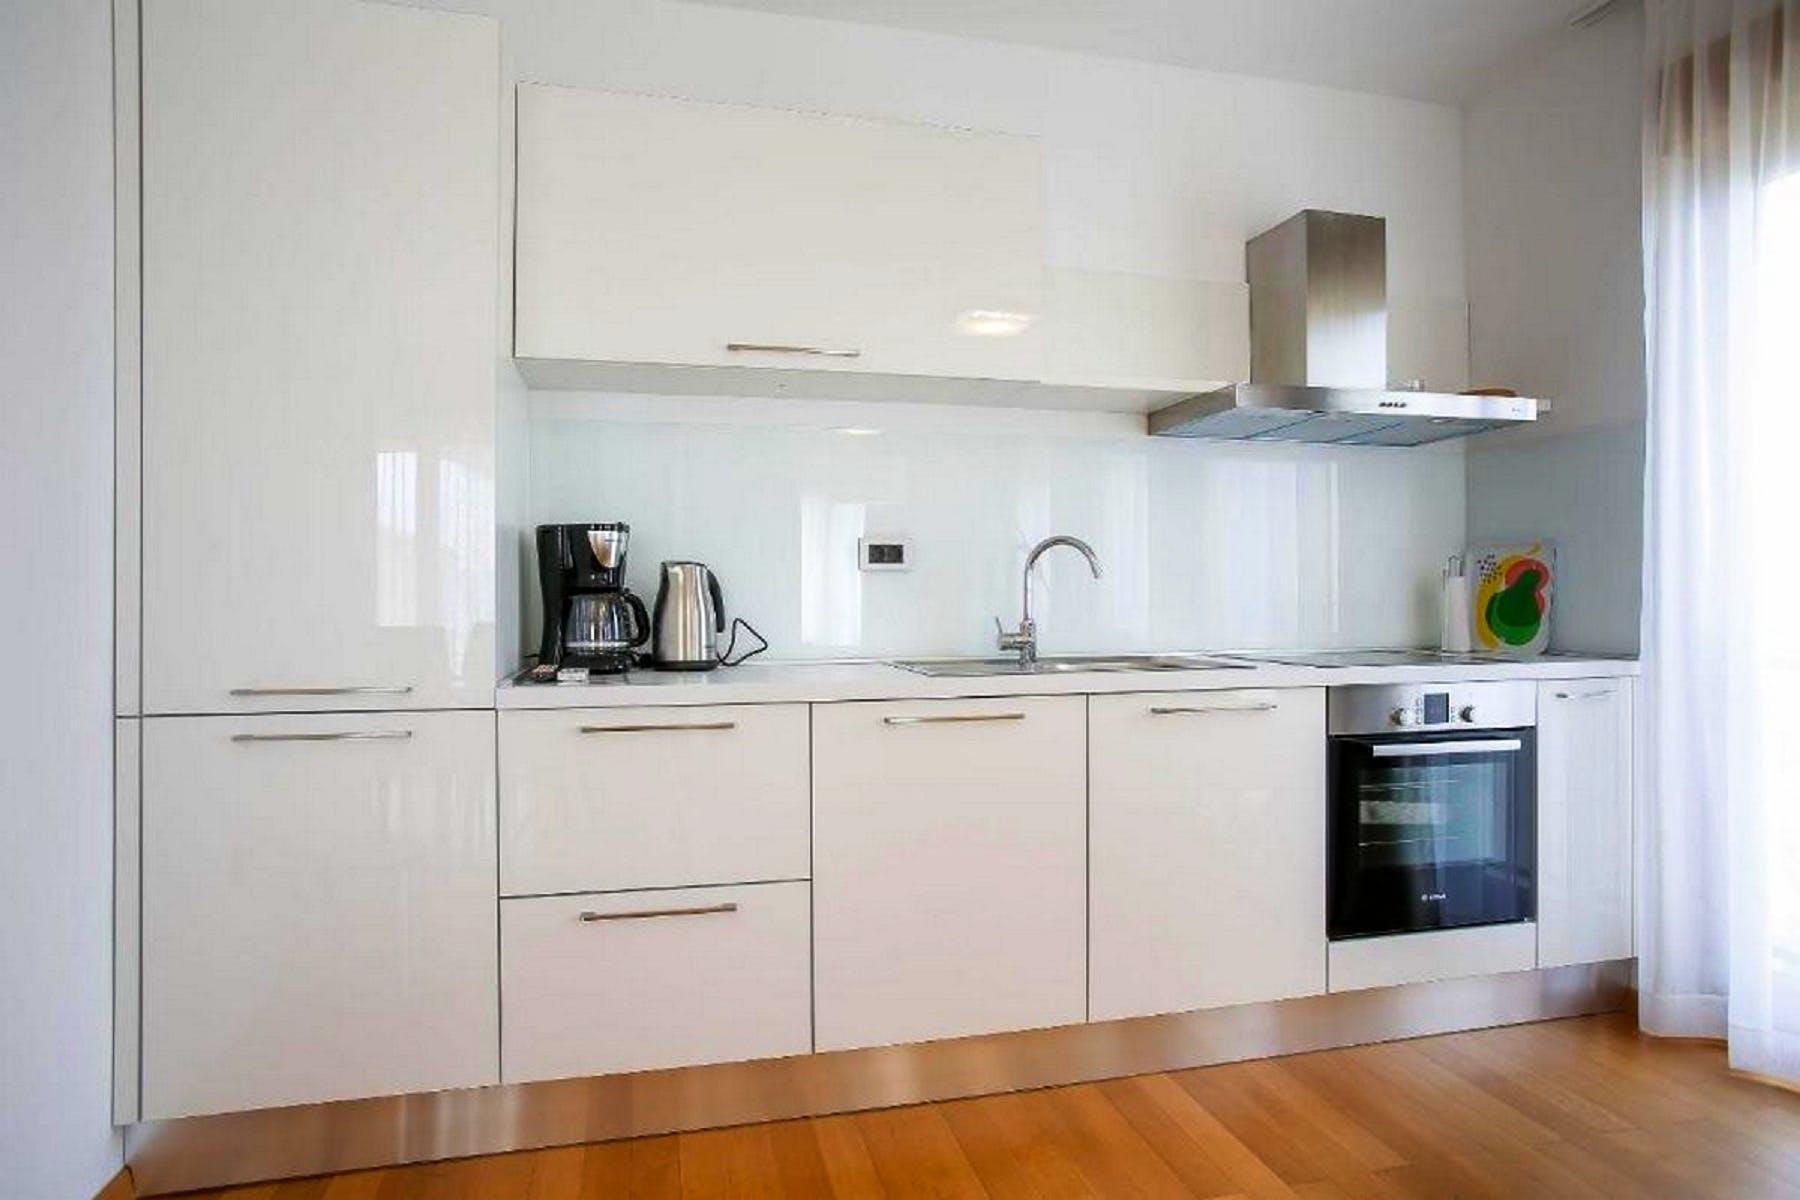 Modernly designed kitchen